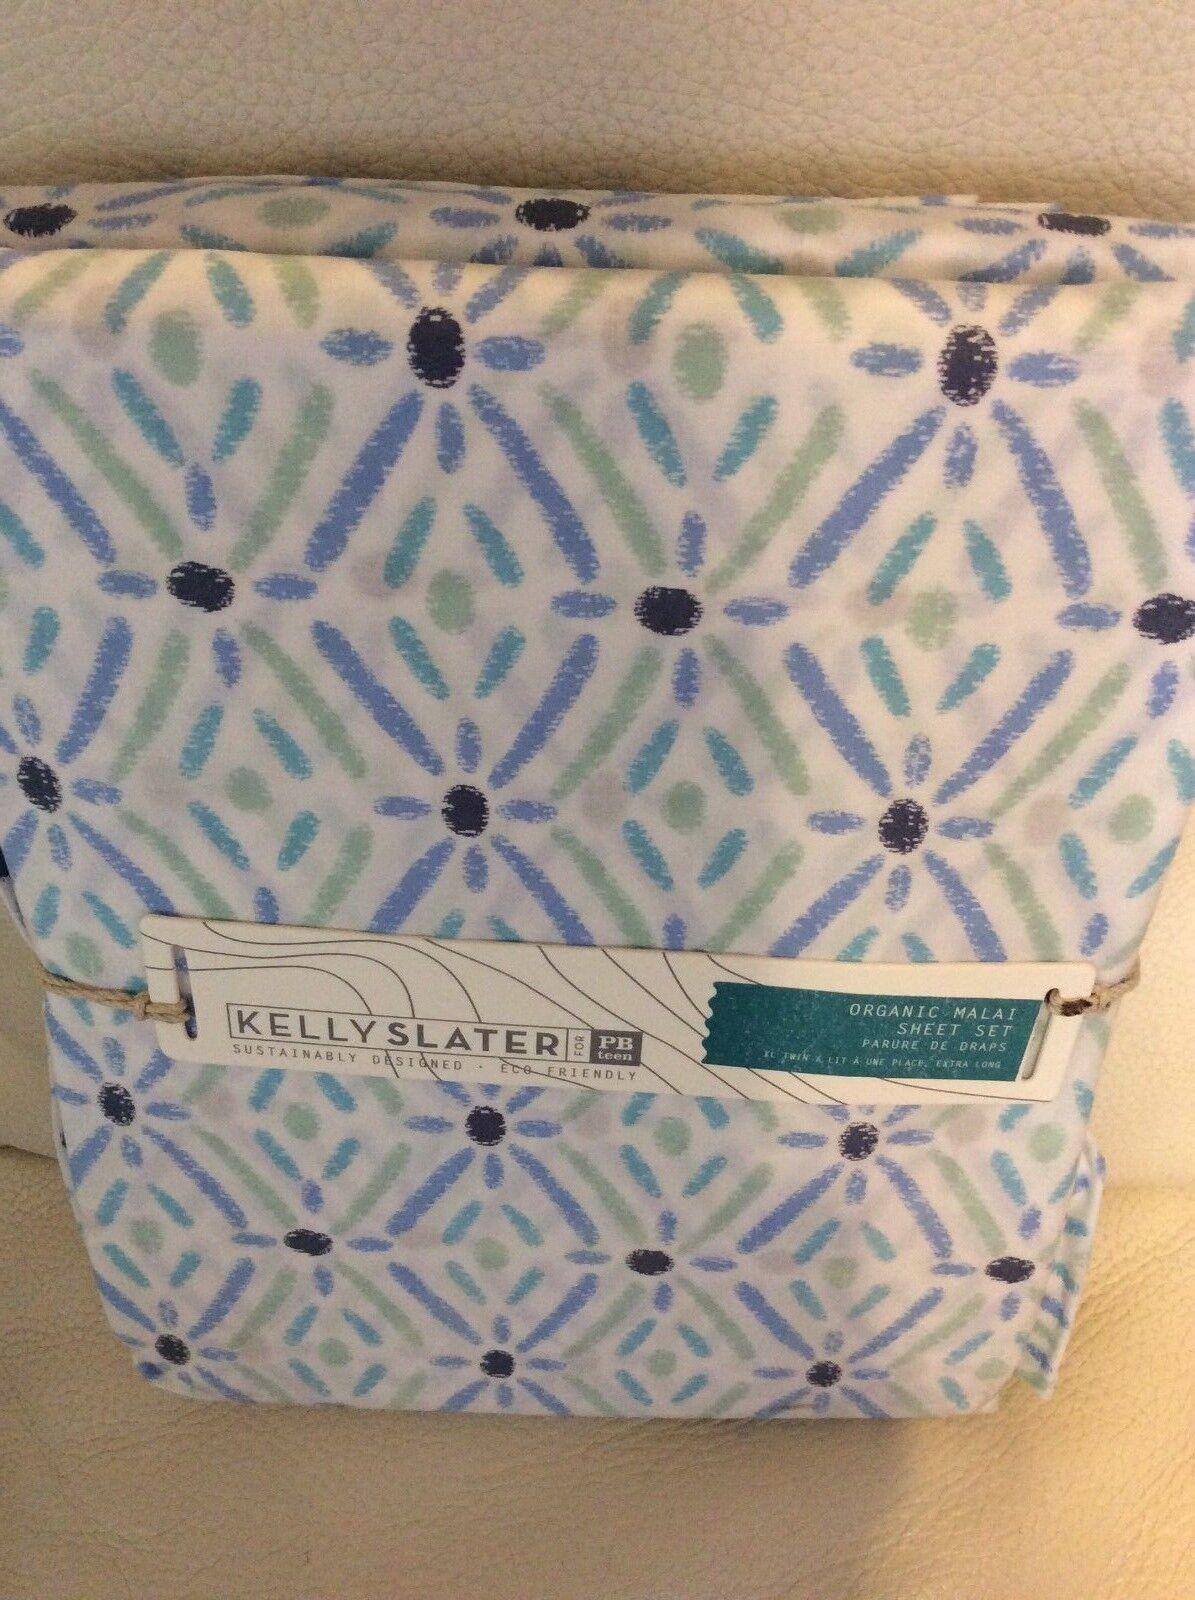 Pottery Barn Teen Kelly Slater Organic Malai XL Twin Twin Sheet Set  NWT